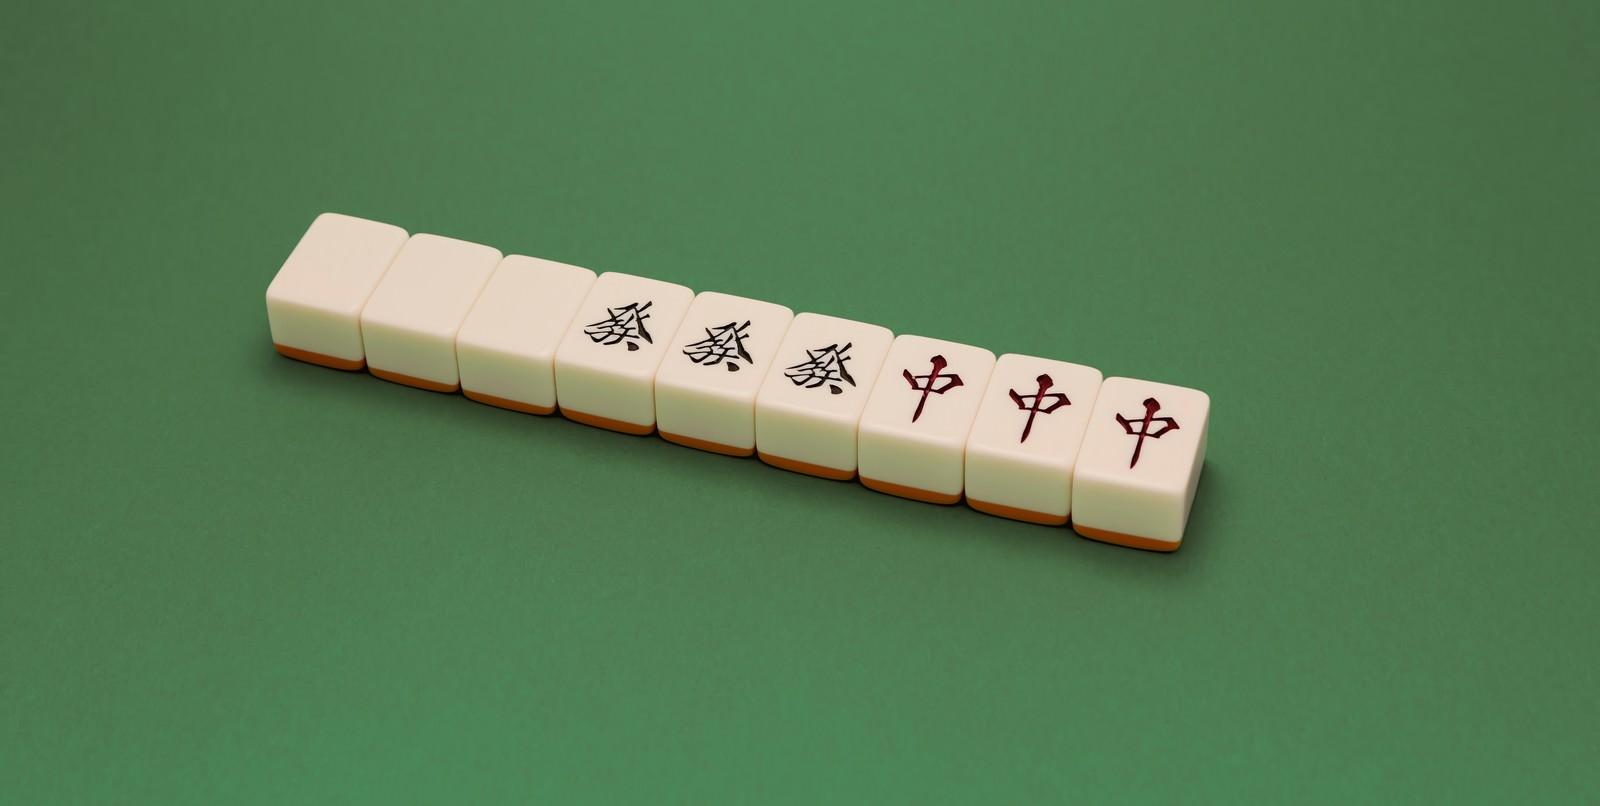 「大三元(麻雀牌)」の写真